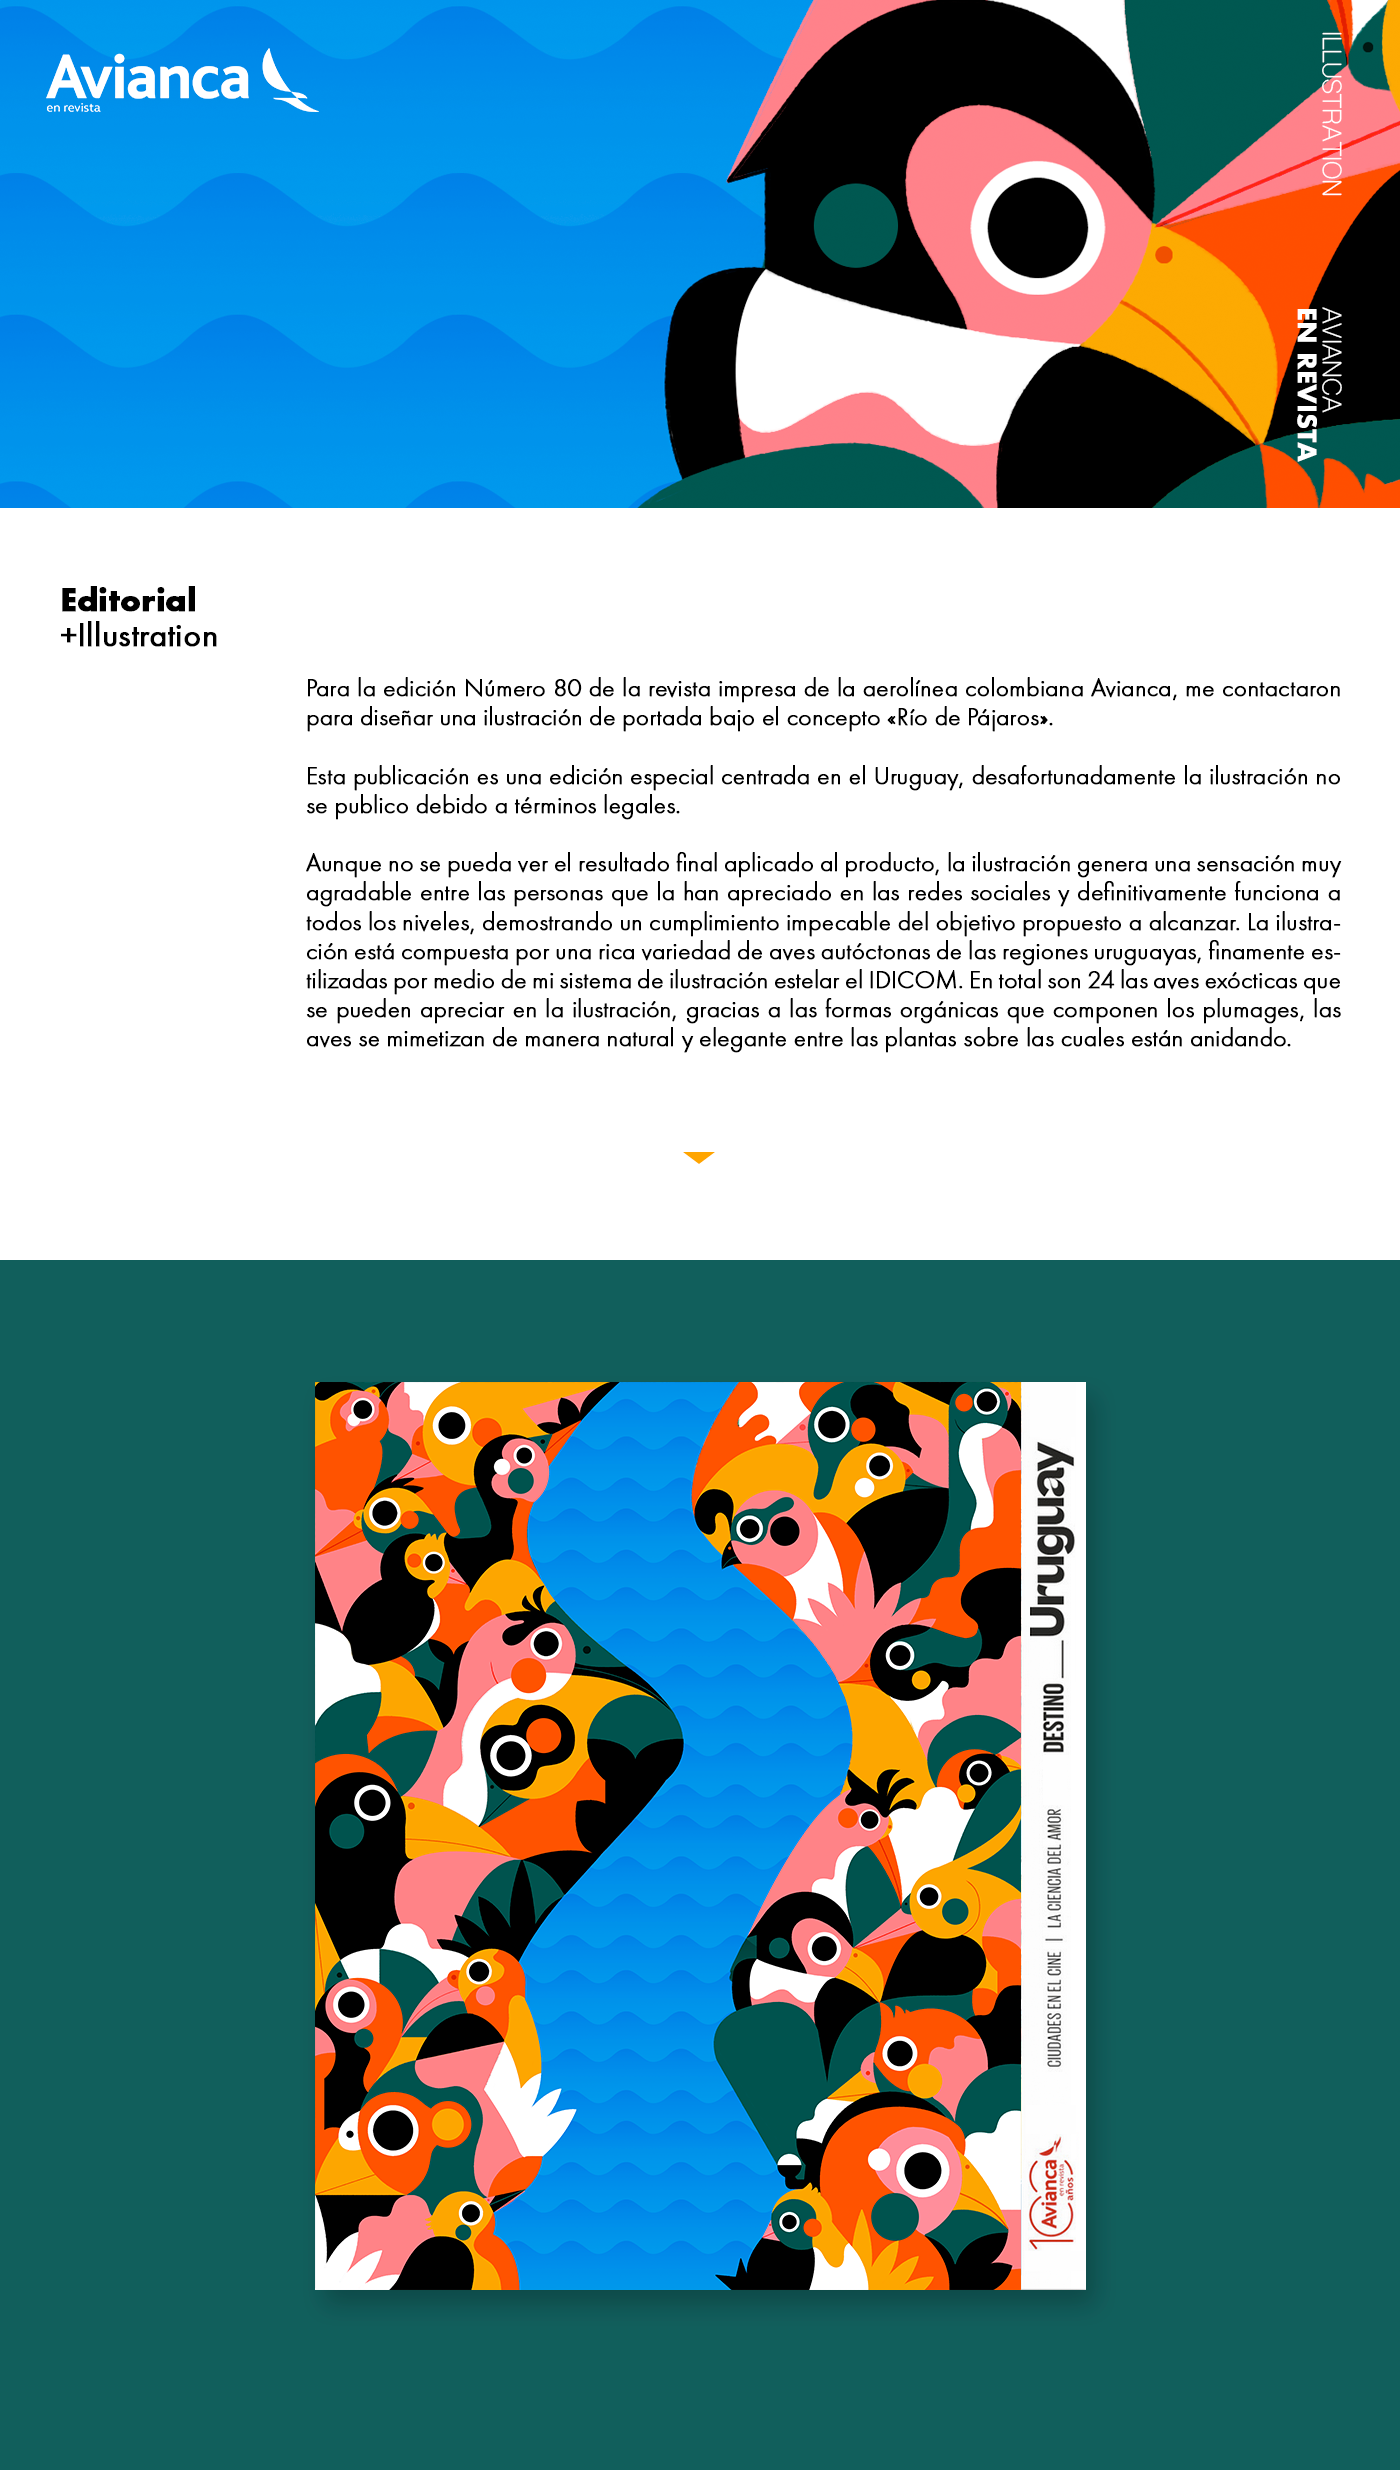 aves Avianca birds cover flat illustrtion ilustracion Jhonny Nuñez magazine revista Vector Illustration